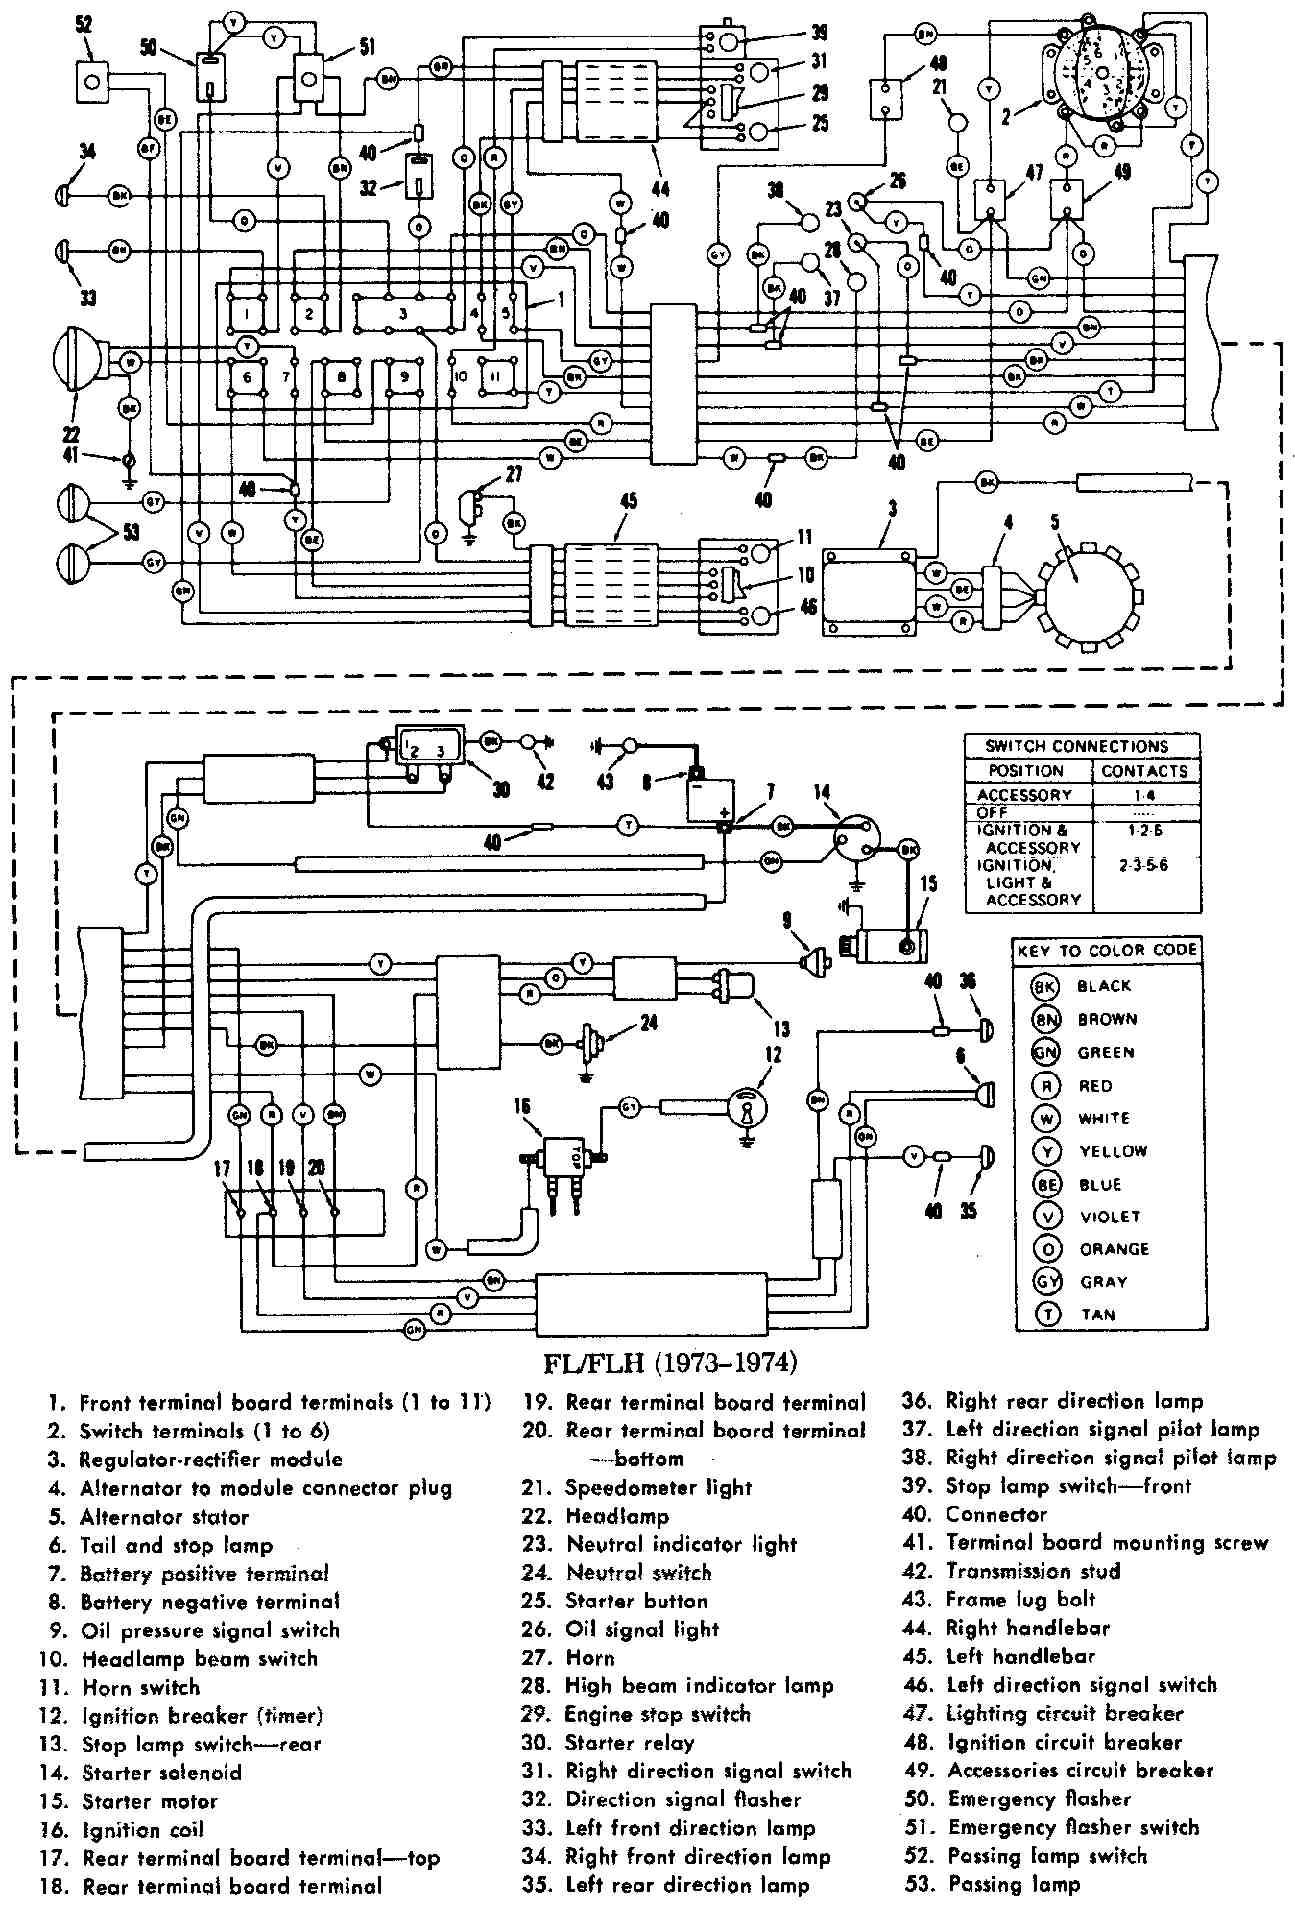 small resolution of 1992 harley davidson 1200 sportster wiring diagram circuit diagram harley night train wiring diagram 1992 harley davidson 1200 sportster wiring diagram